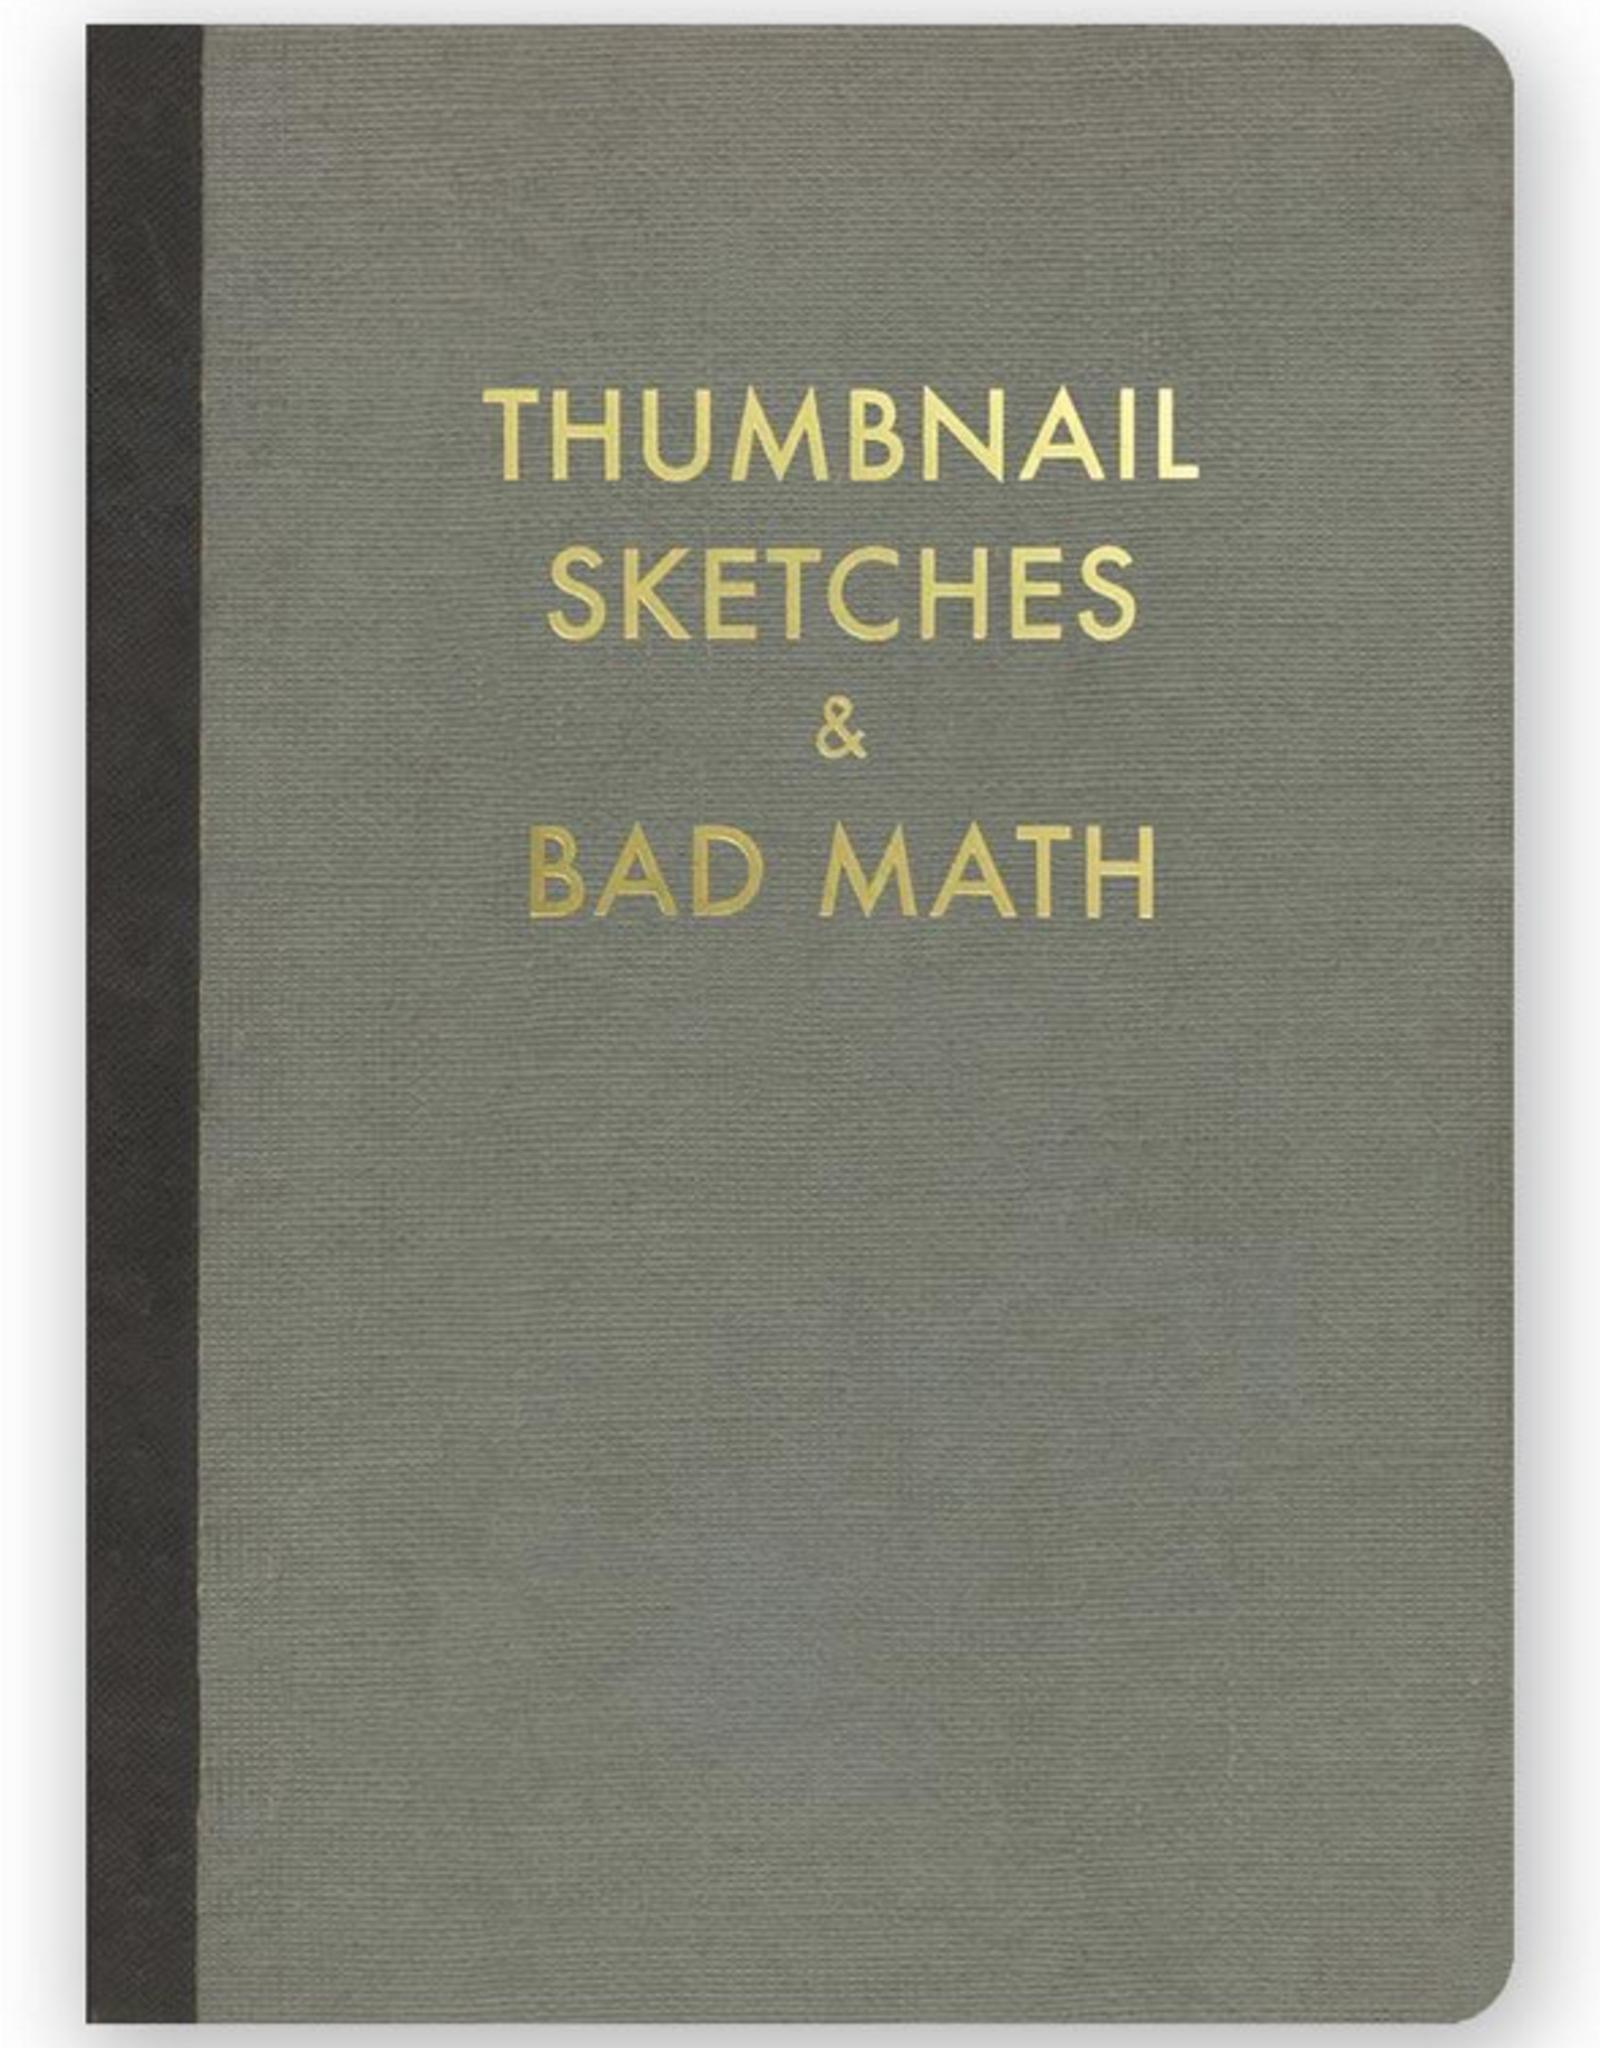 Thumbnail Sketches and Bad Math Journal